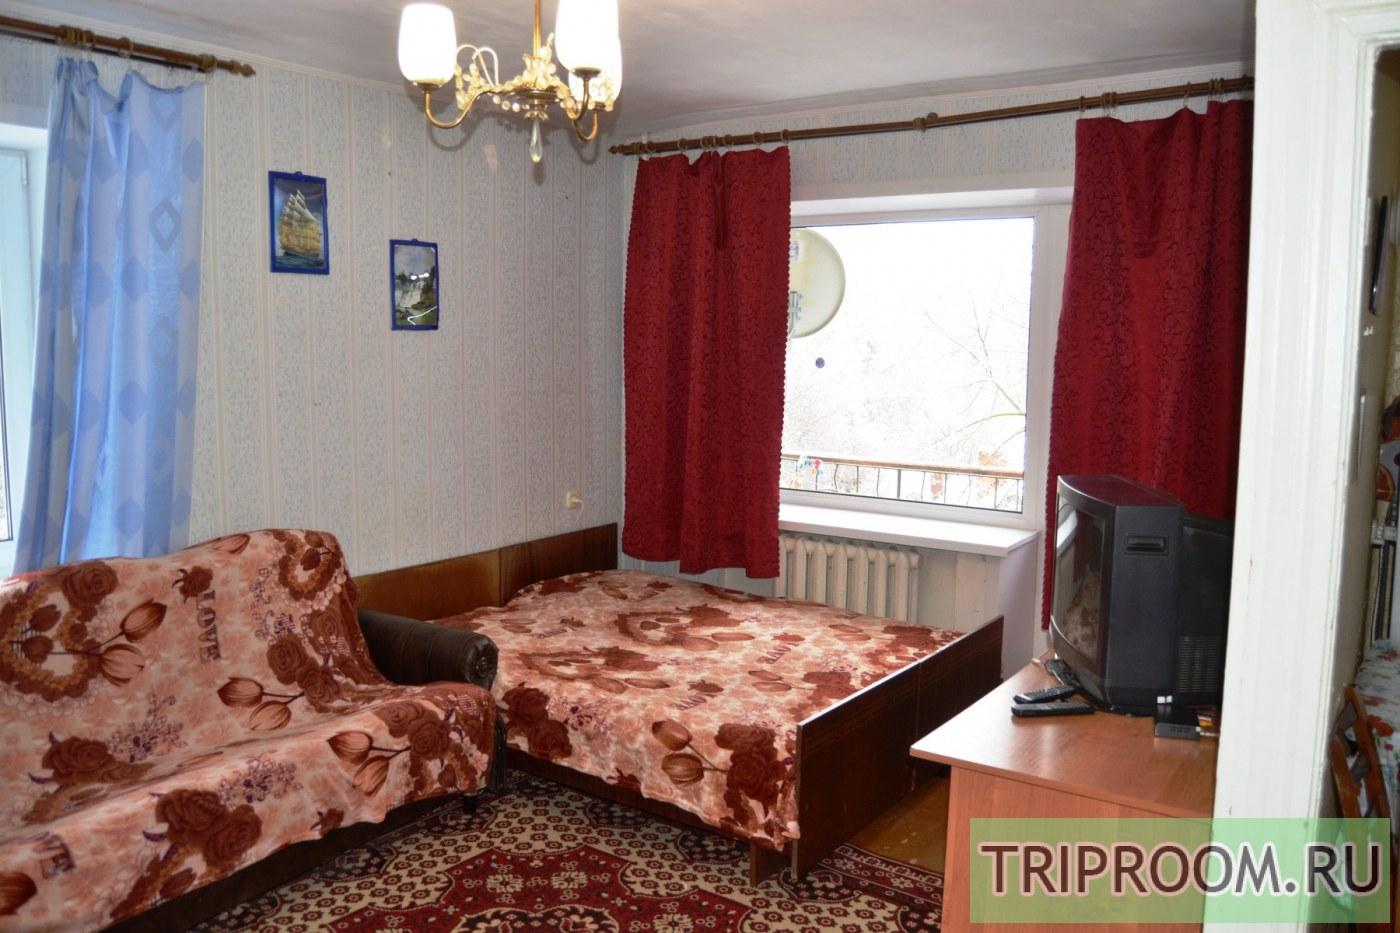 1-комнатная квартира посуточно (вариант № 38767), ул. Дохтурова улица, фото № 1